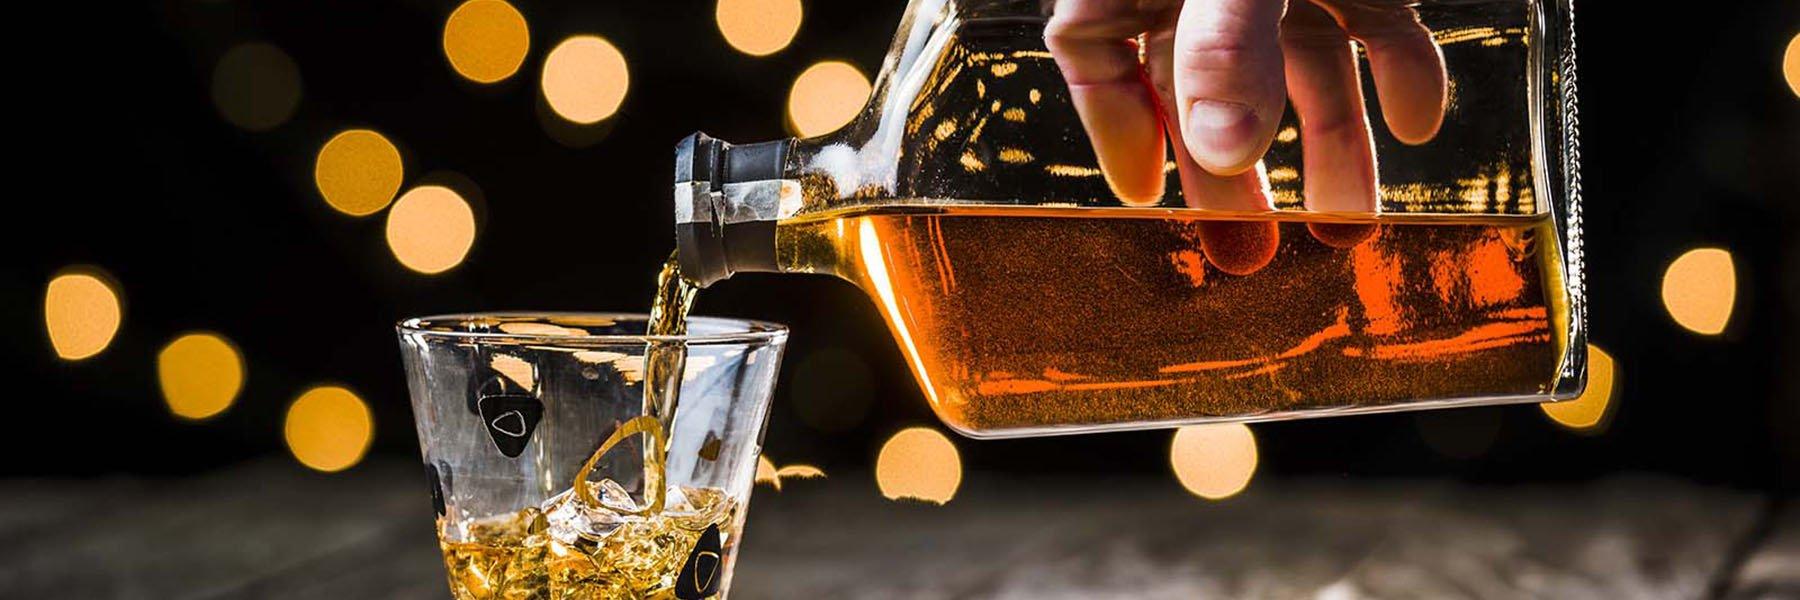 Corporate Liquor Gift Baskets